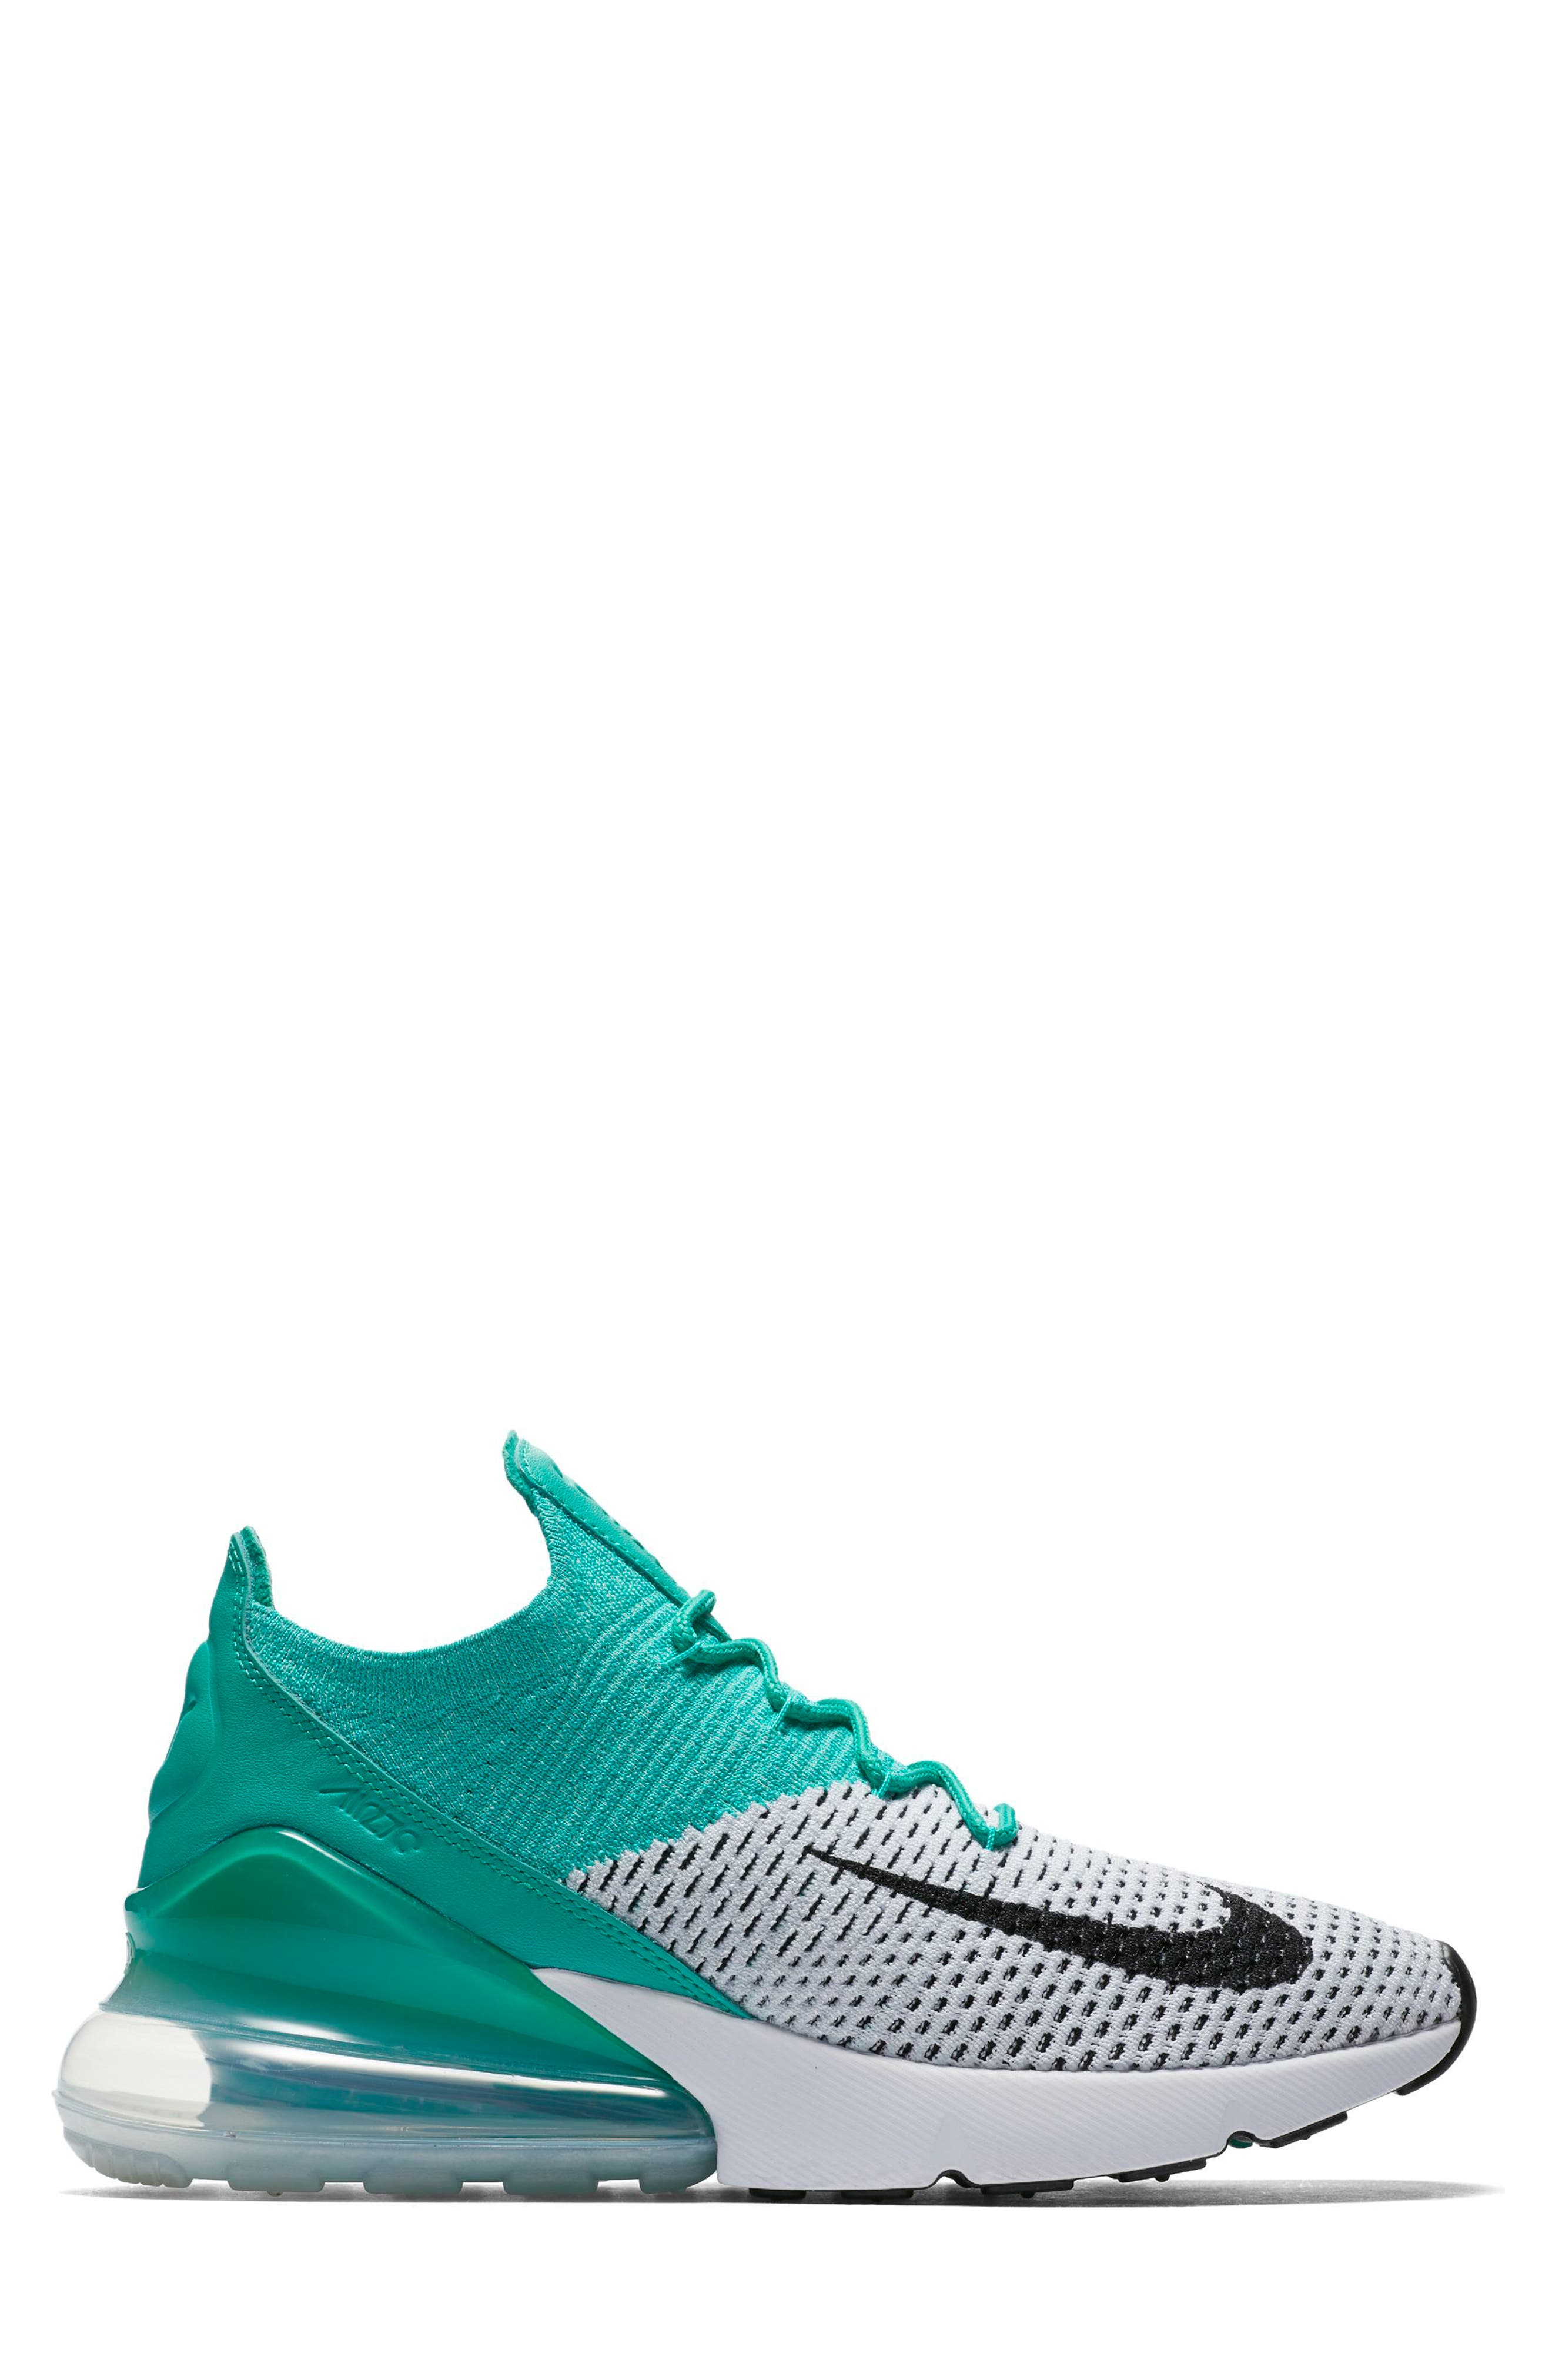 Air Max 270 Flyknit Sneaker,                             Alternate thumbnail 3, color,                             EMERALD/ BLACK/ PURE PLATINUM